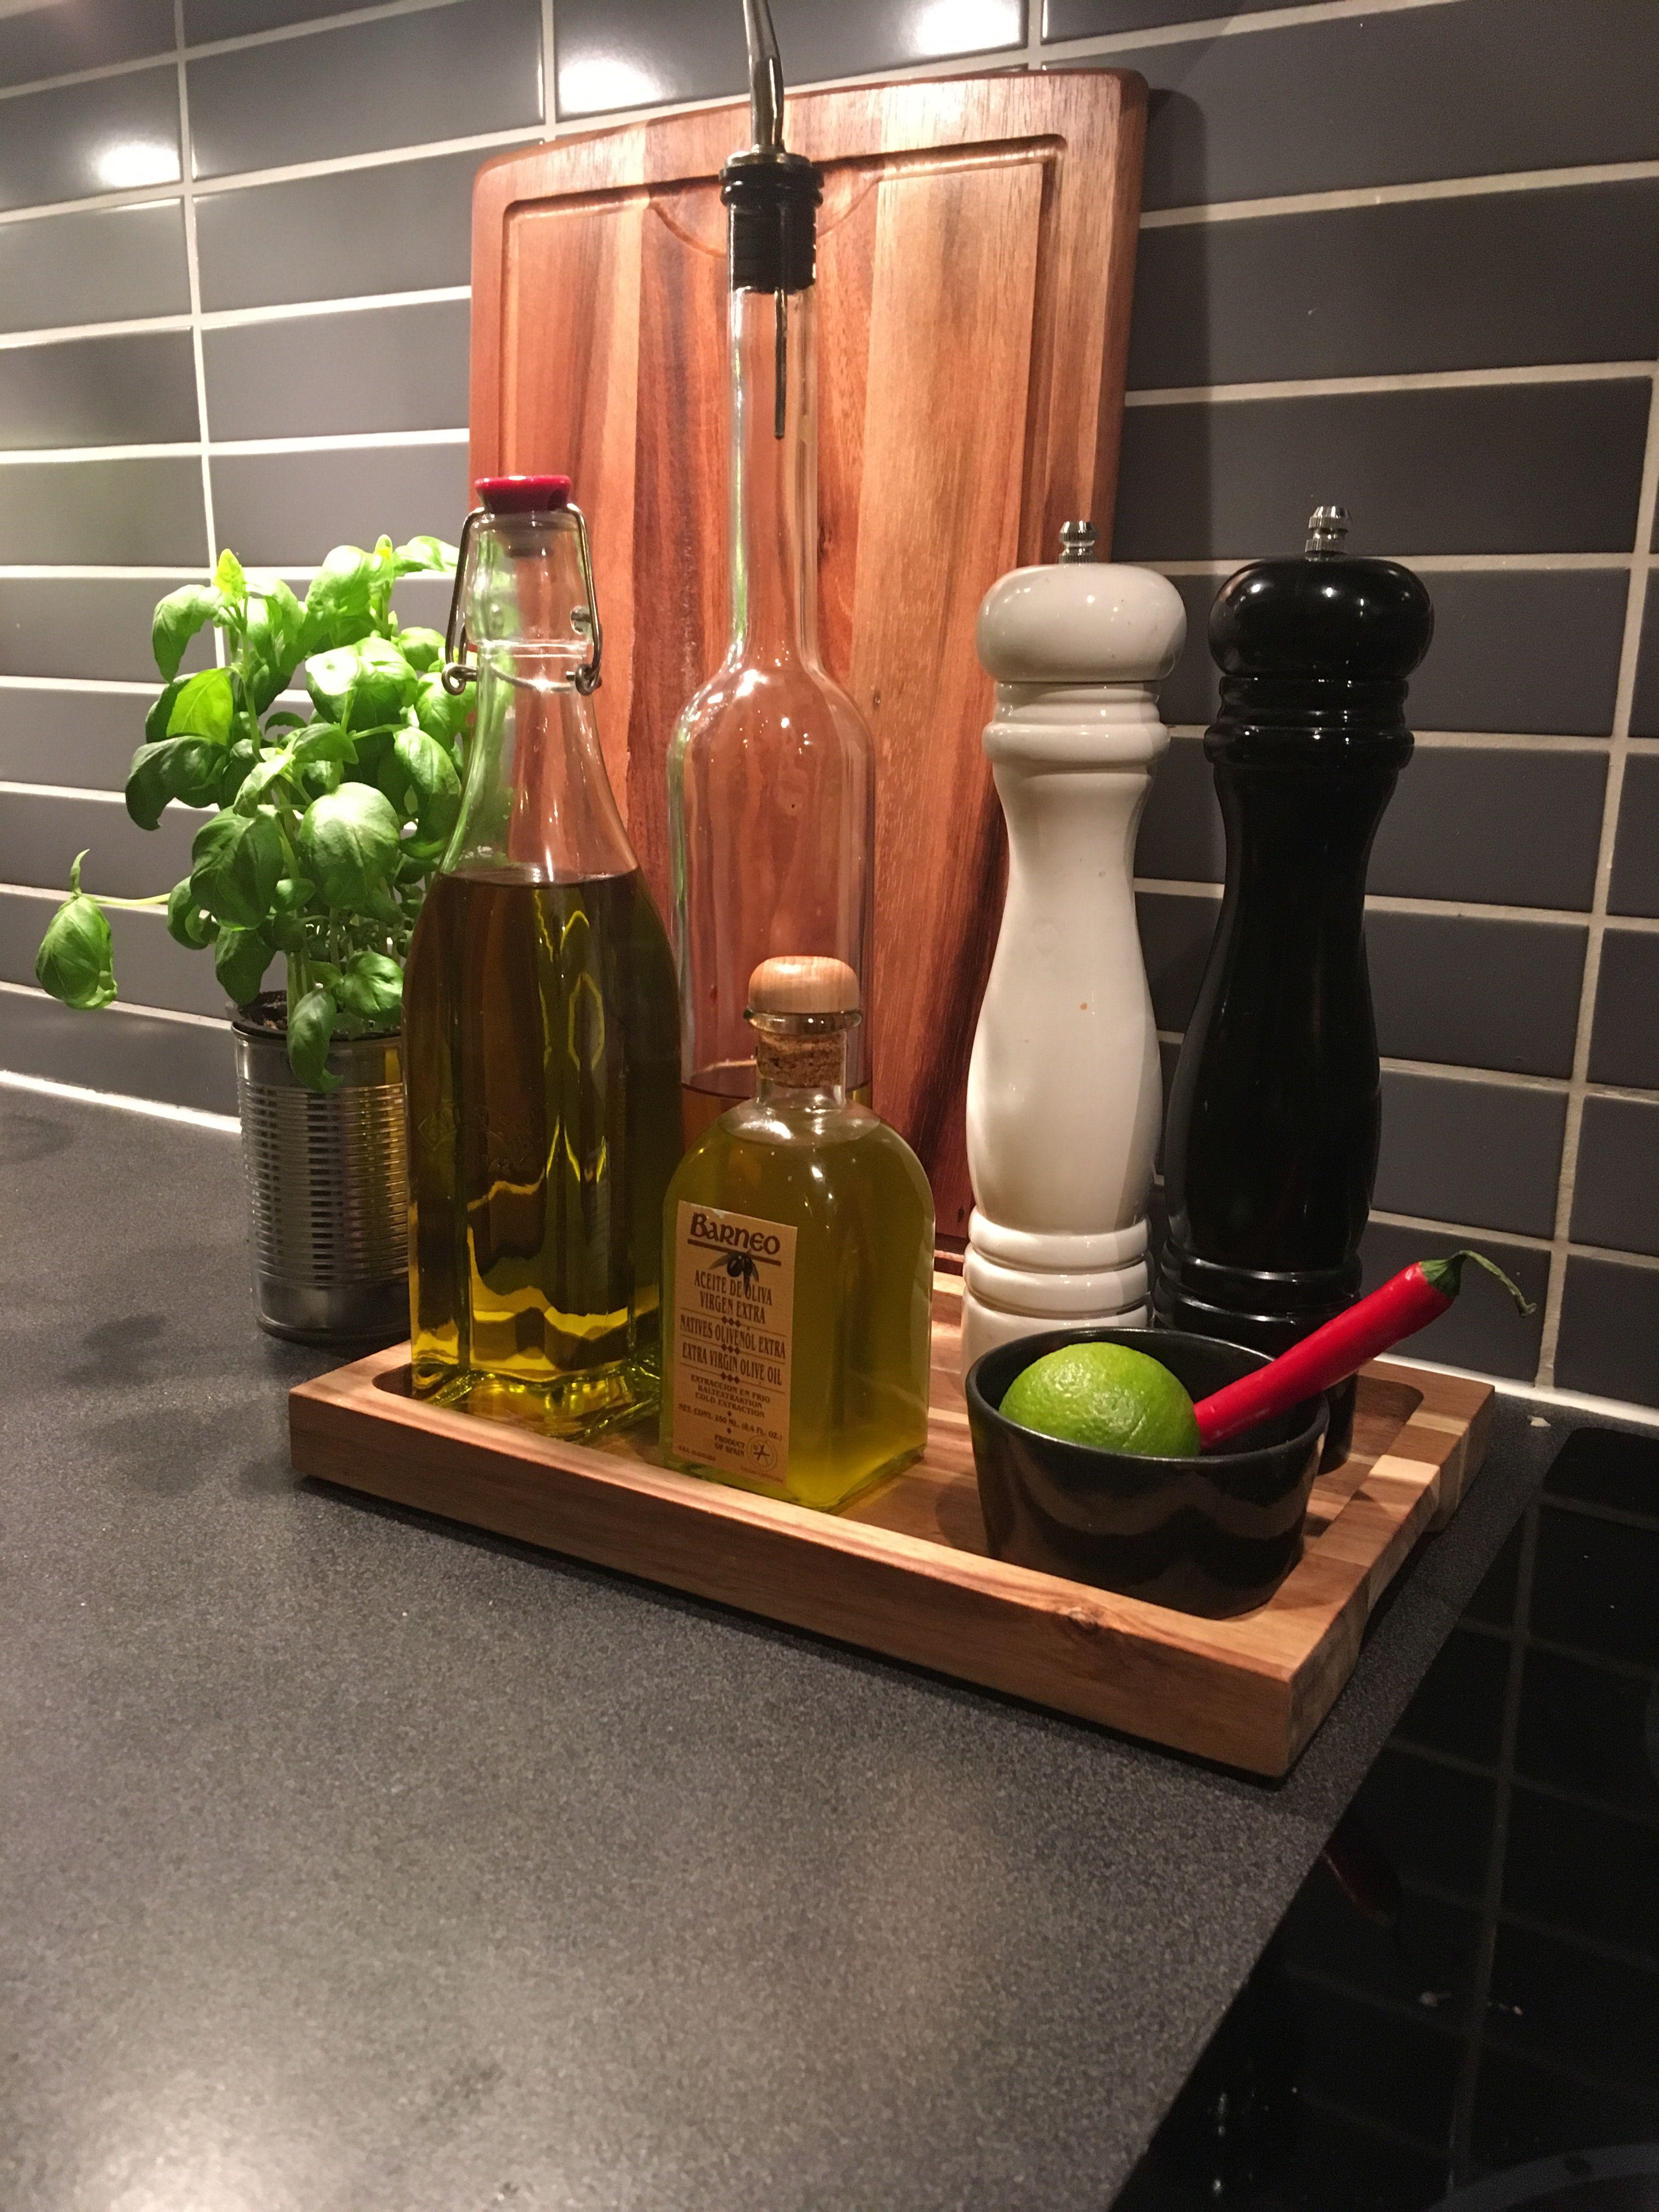 Pin By Maria Castro On Kok Kitchen Decor Collections Kitchen Countertop Decor Kitchen Counter Decor